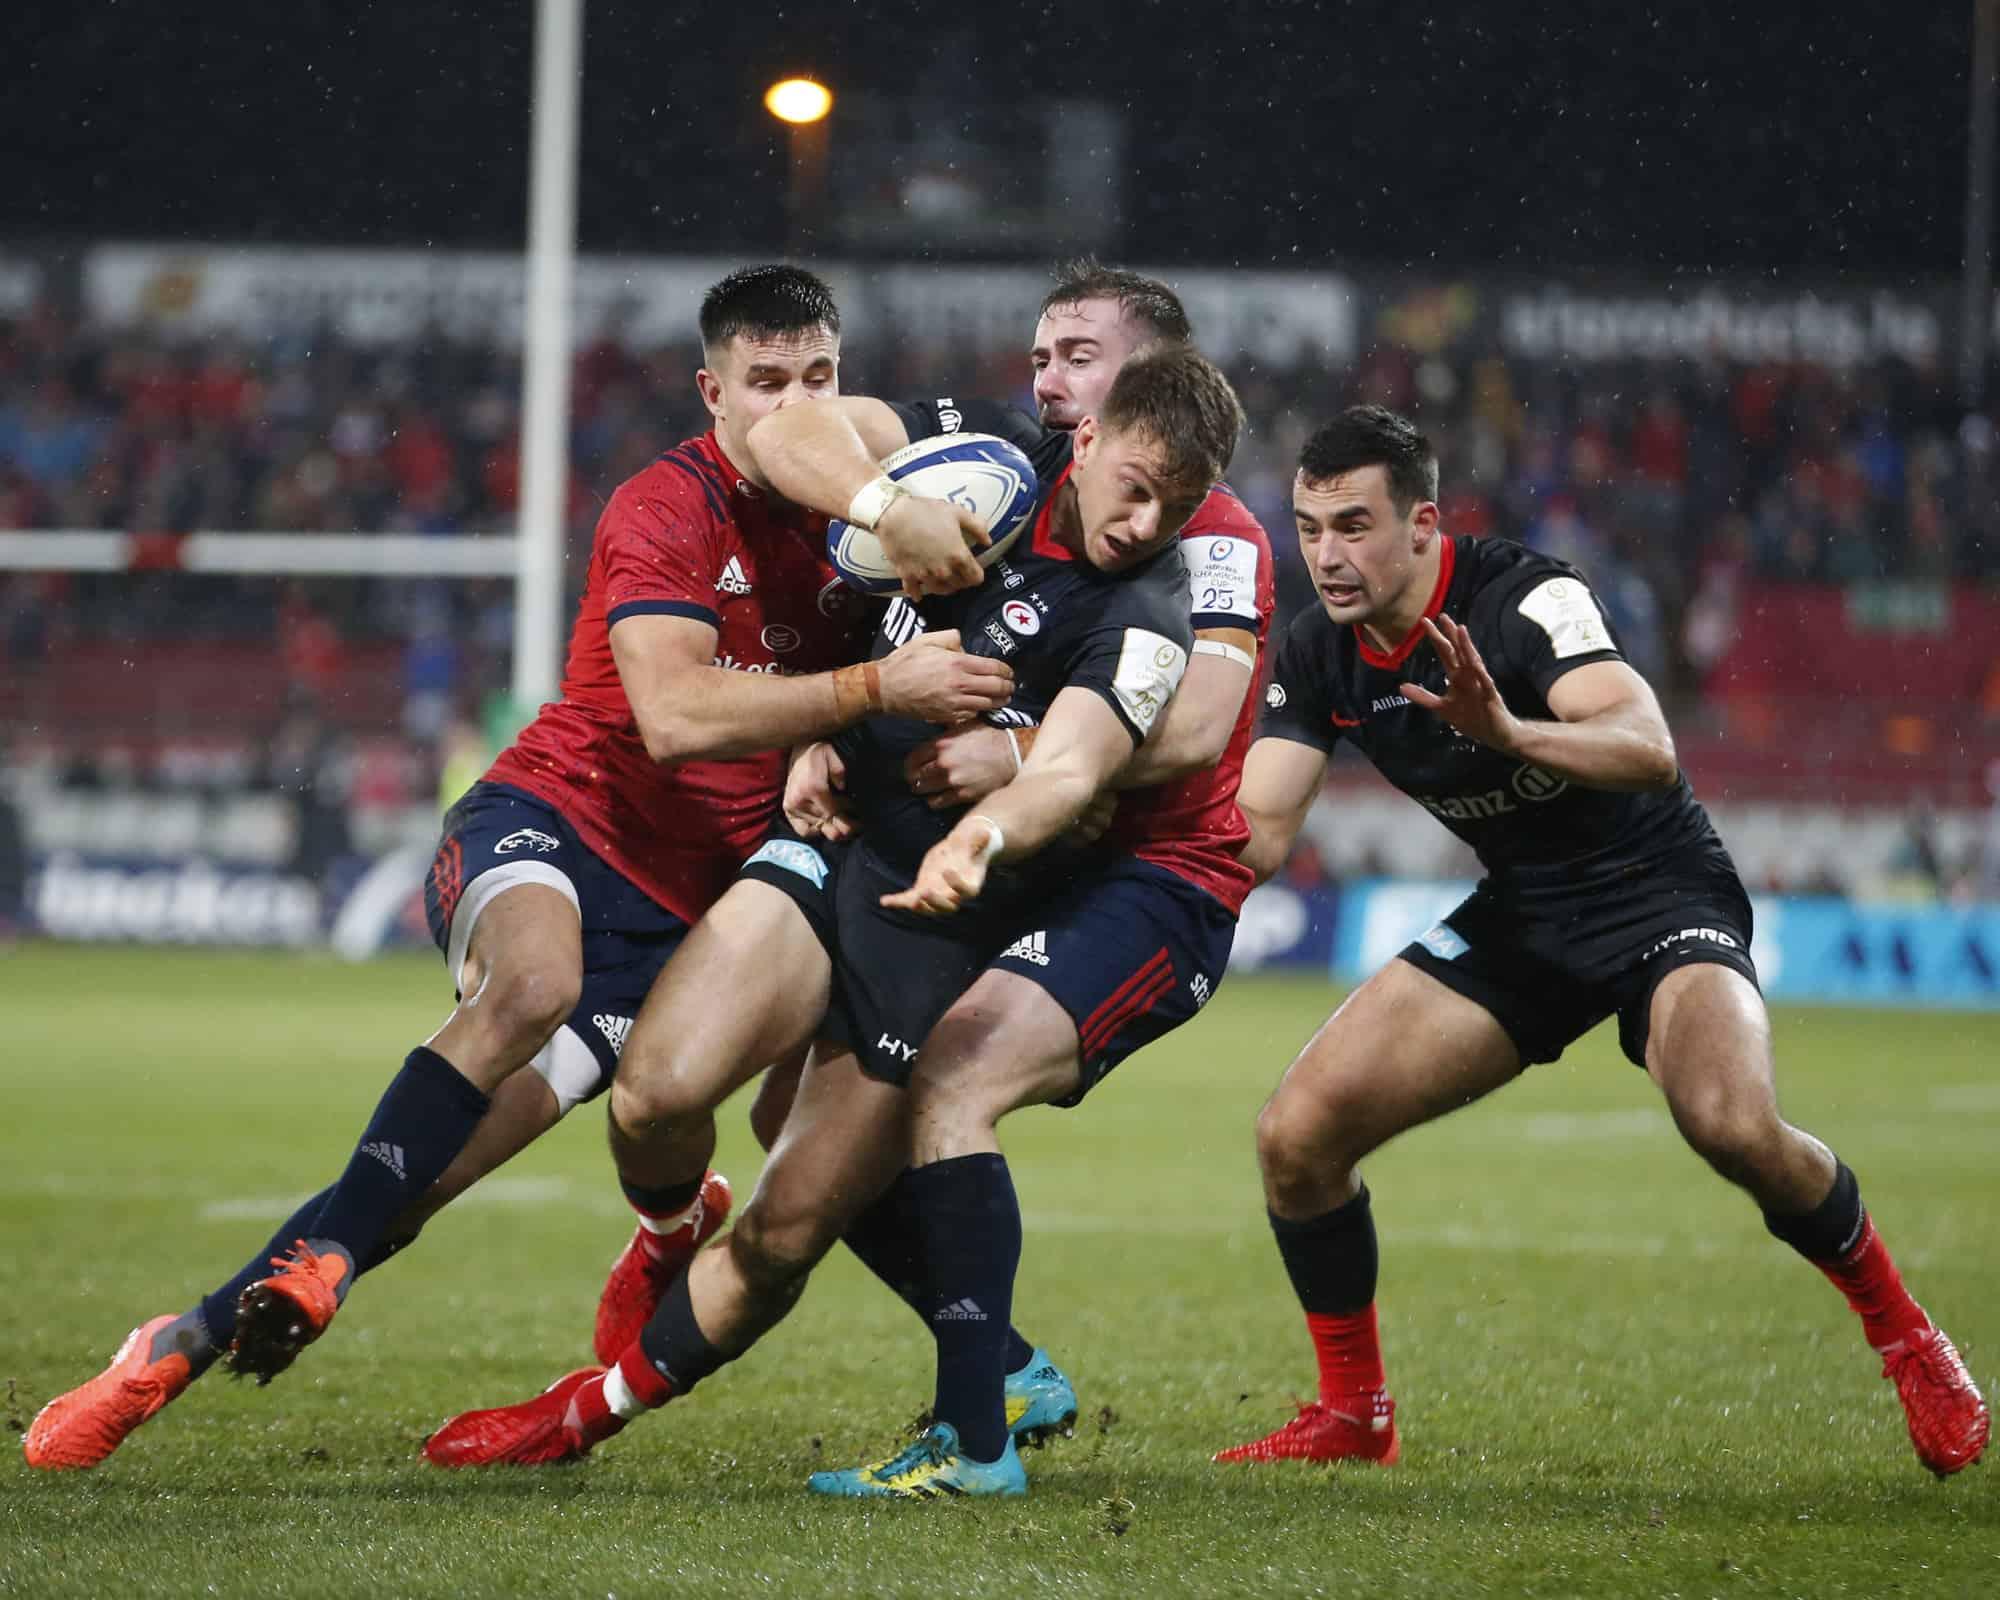 Munster v SaracensHeineken European Rugby Champions Cup